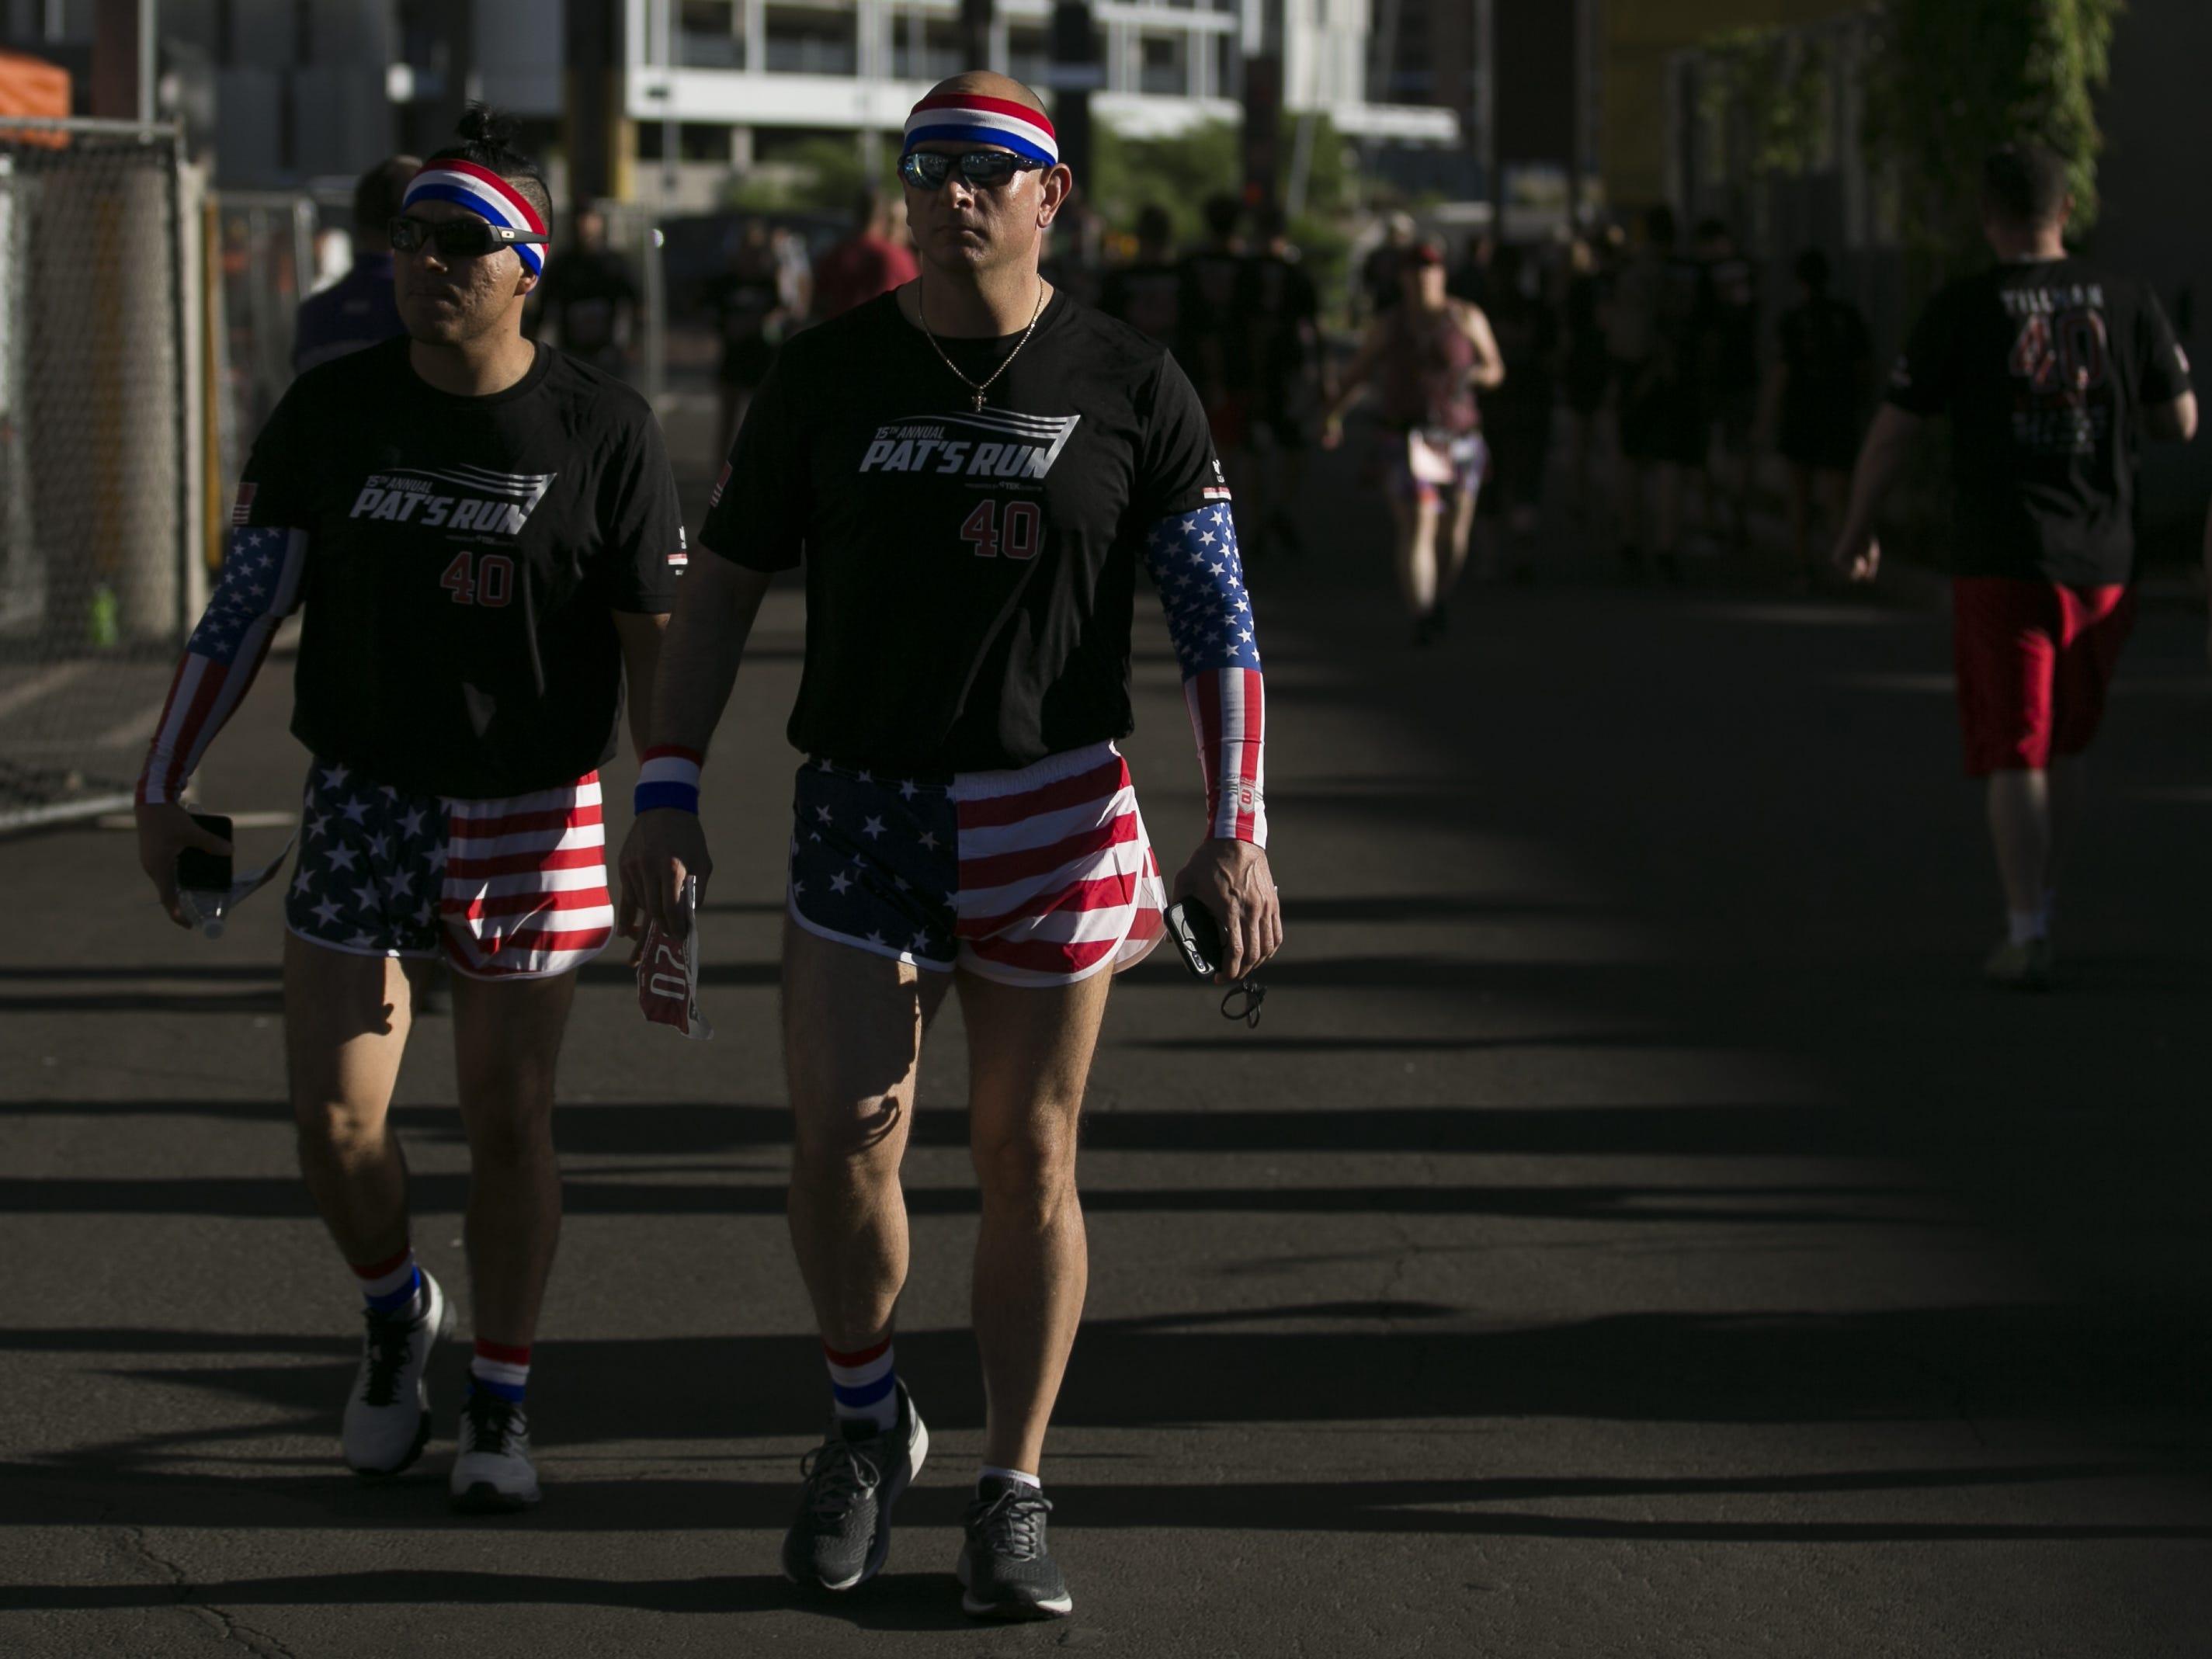 Dionicio Jaramillo (left) and Mike Hennessy (right) walk past Pat's Run 2019 in Tempe on April 27, 2019.